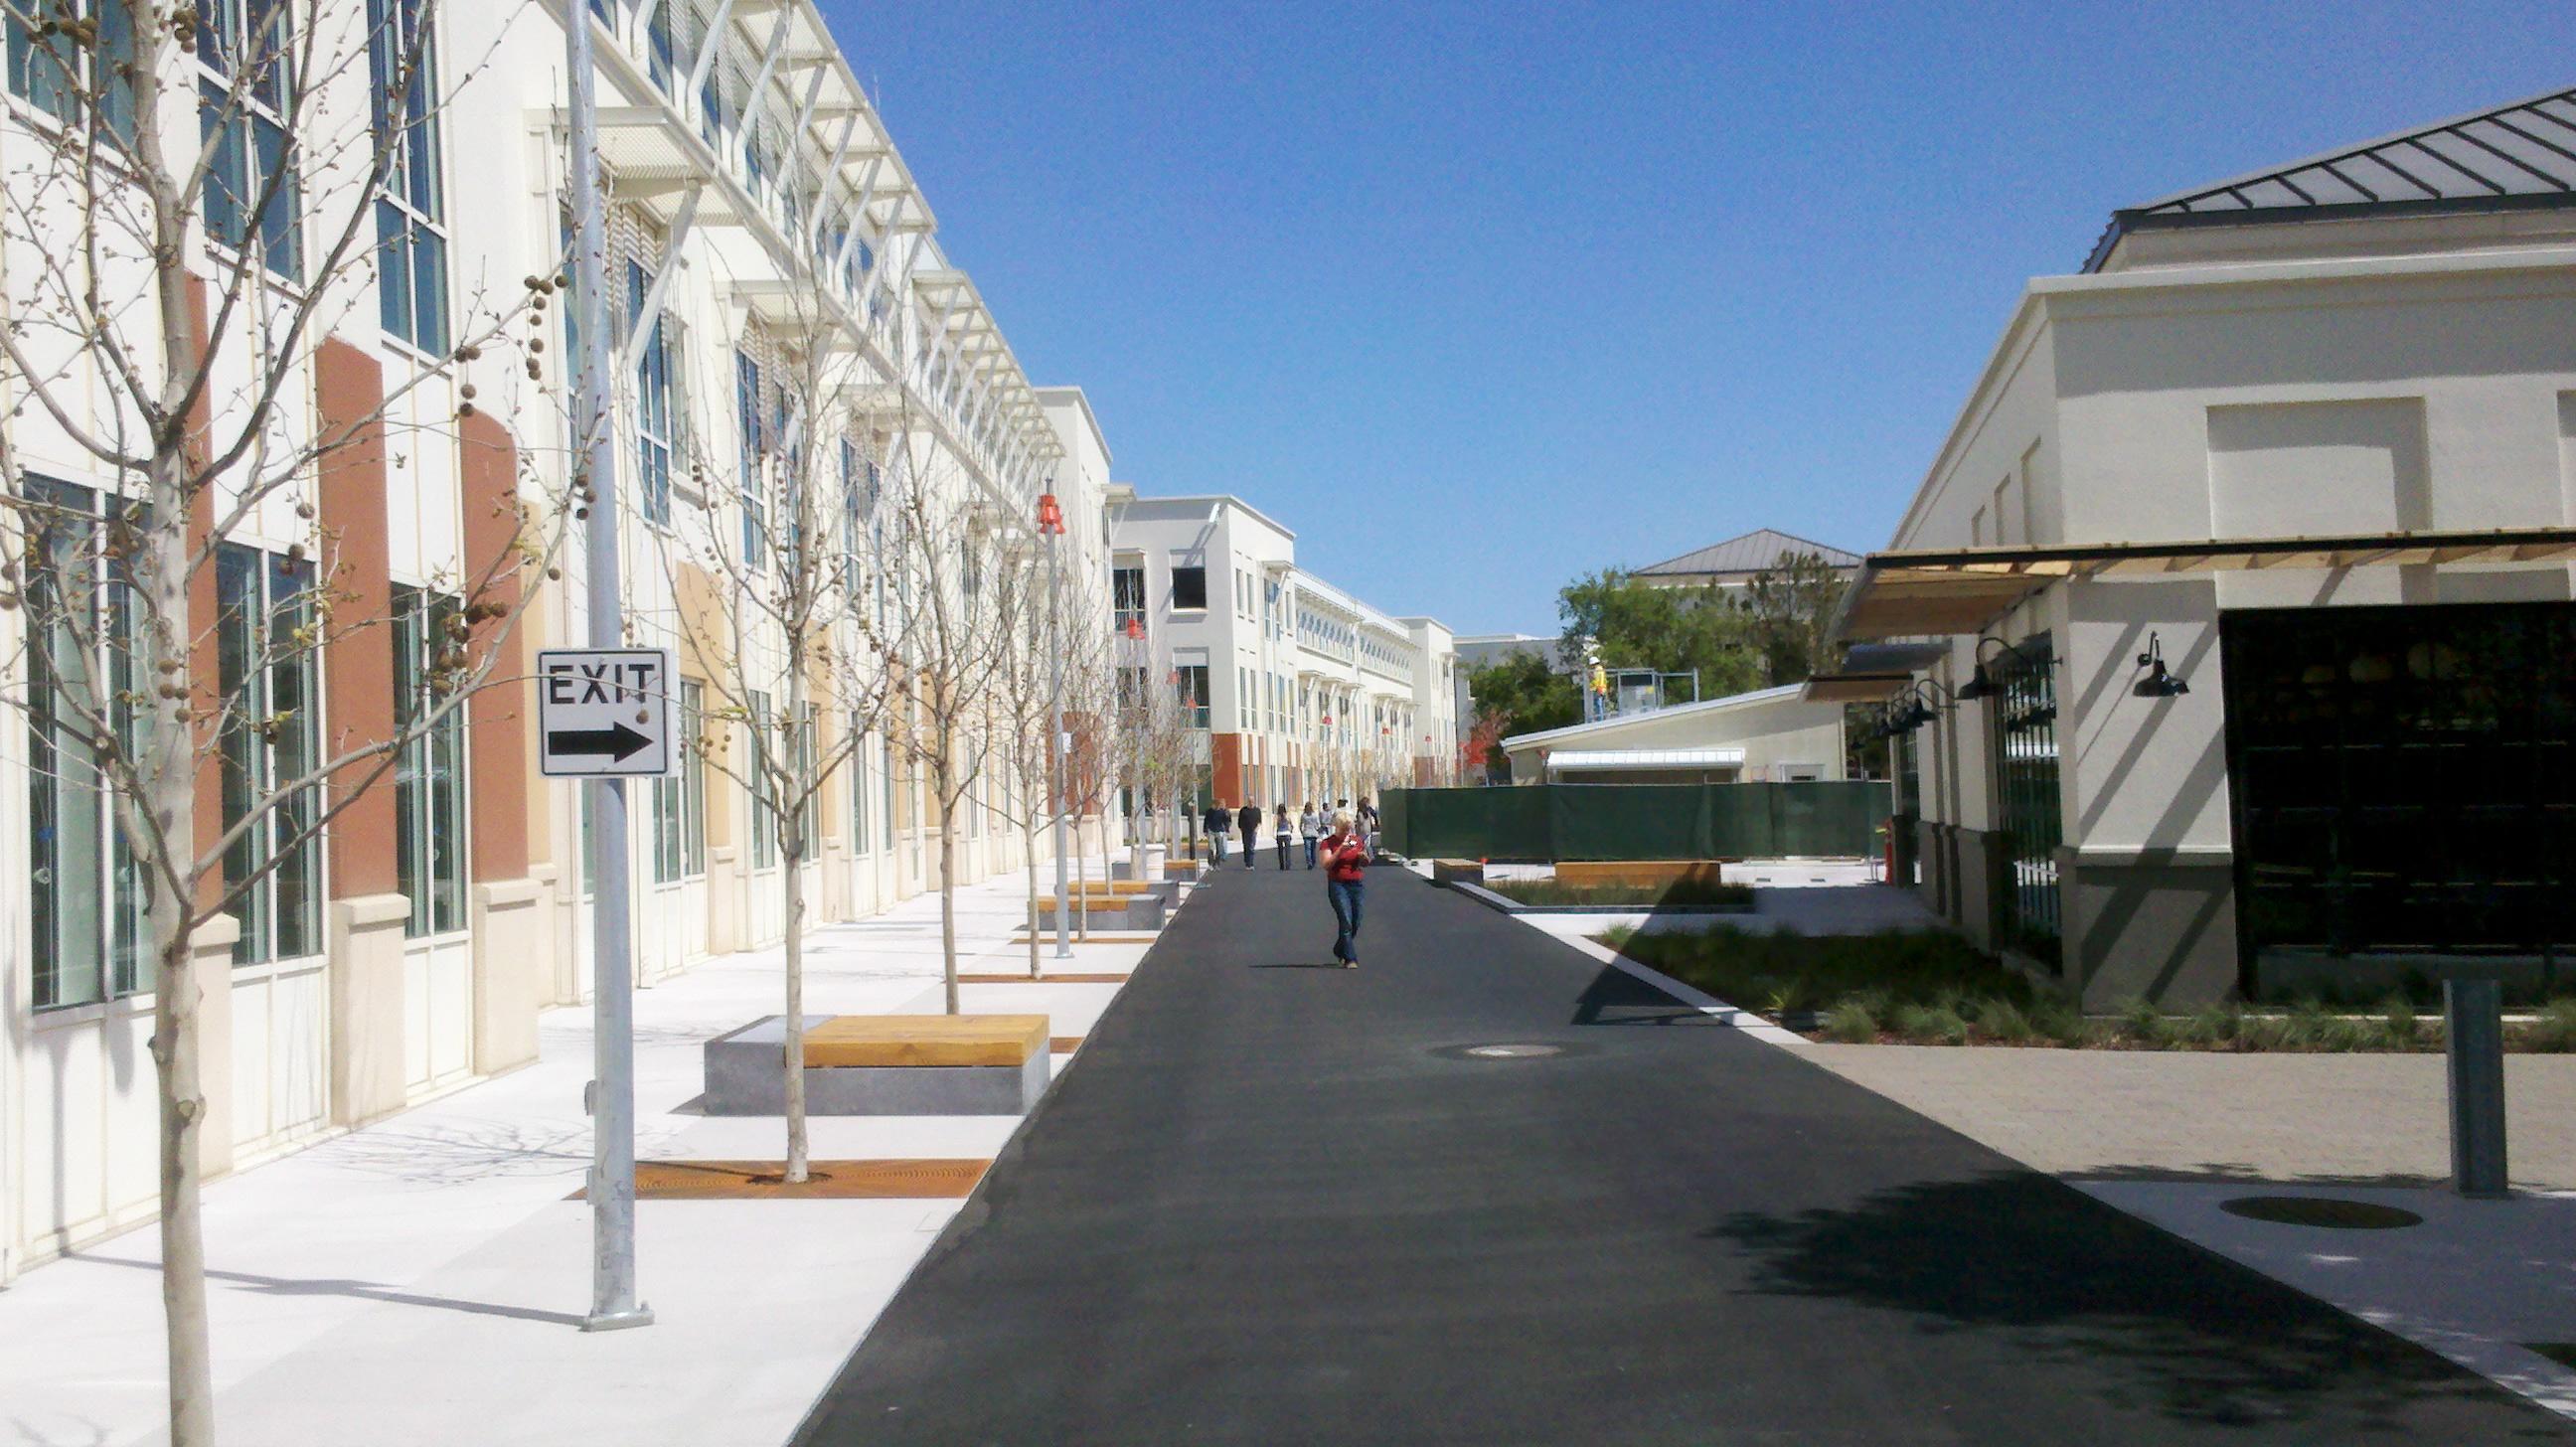 Facebook's Menlo Park HQ